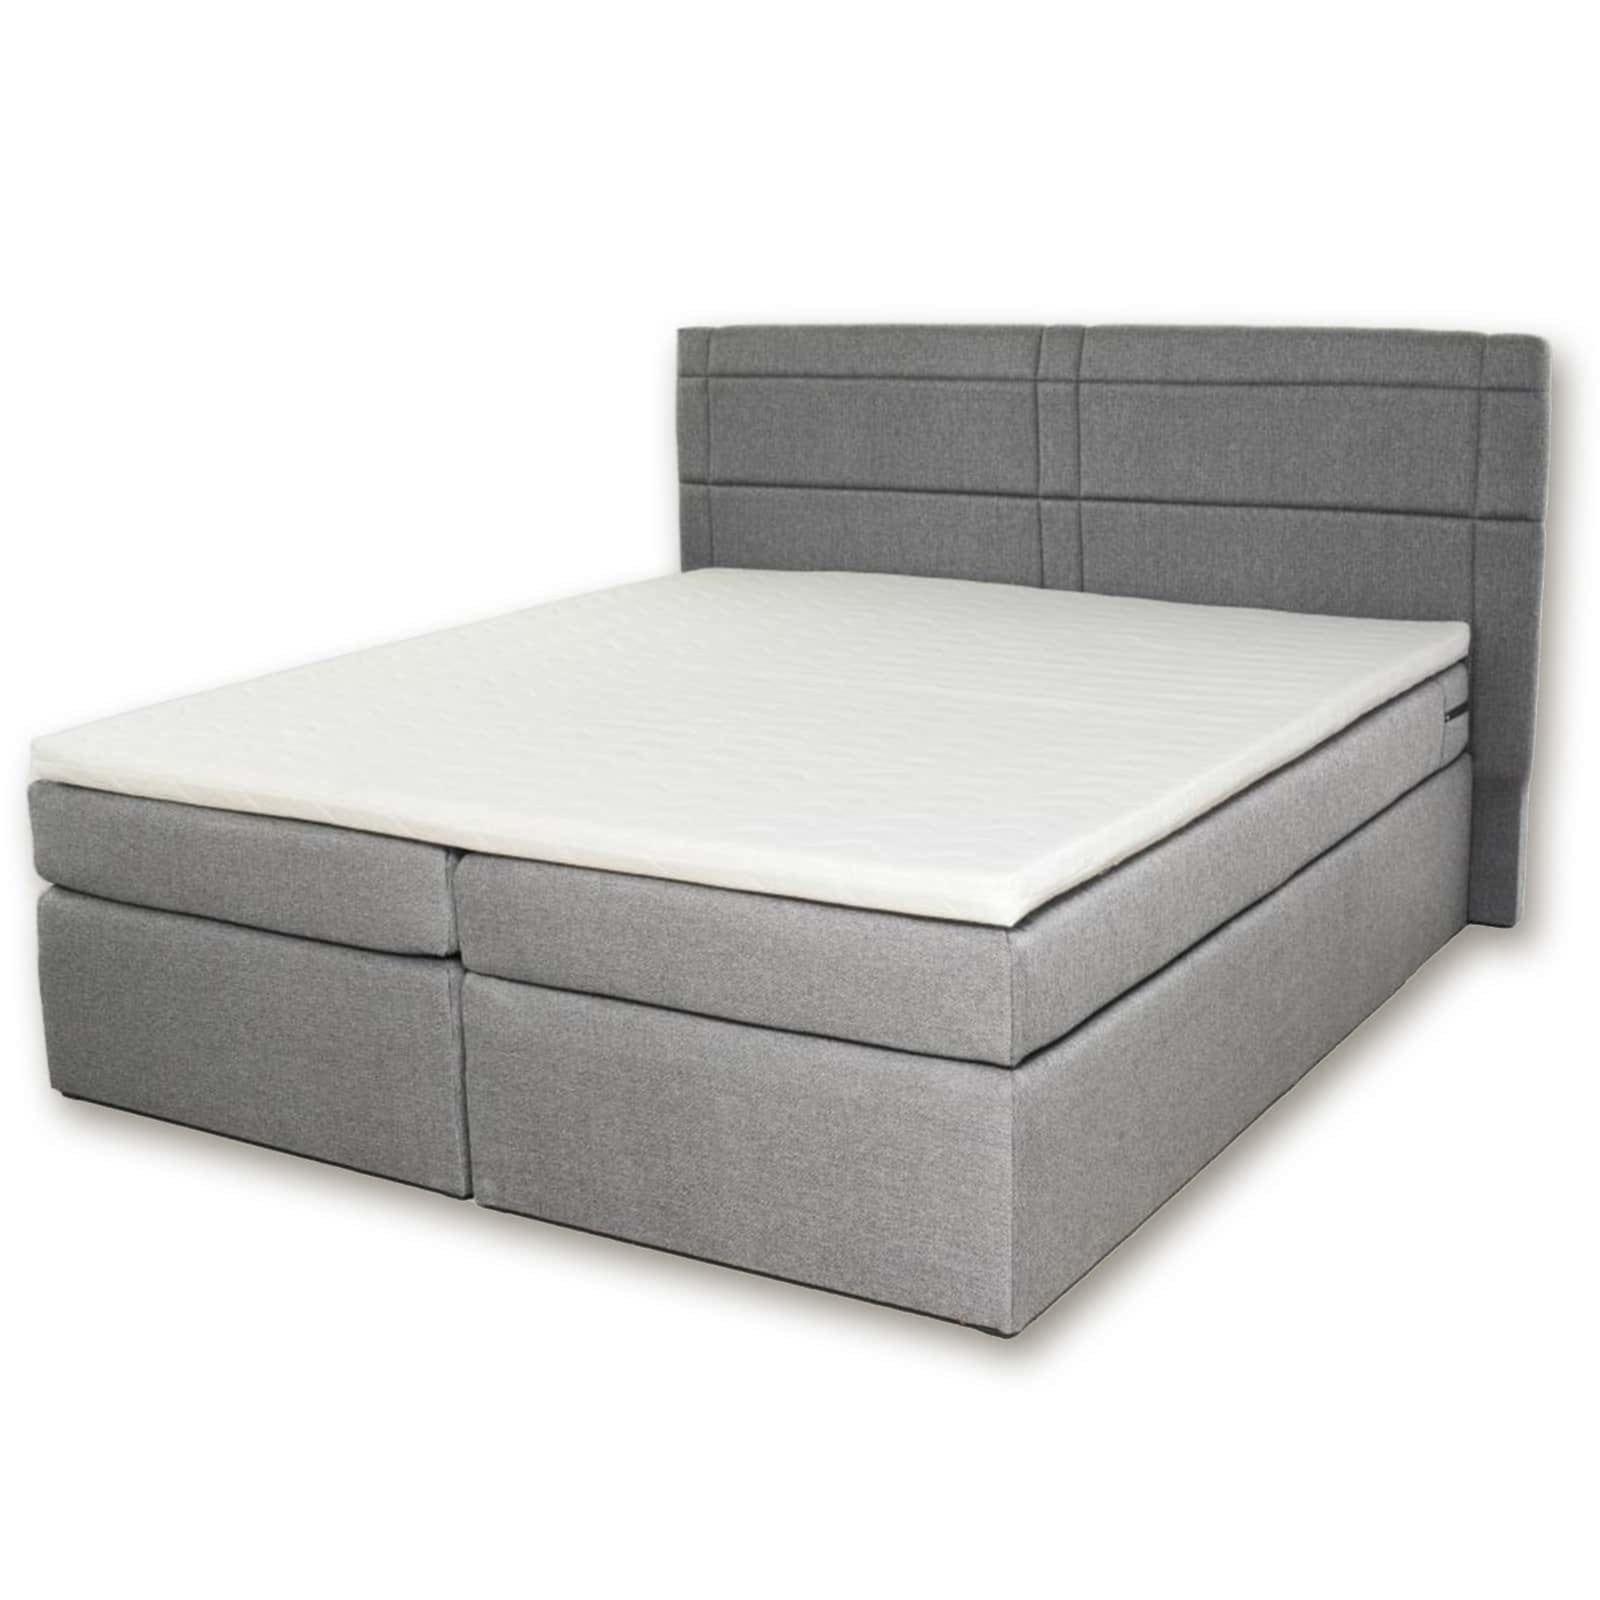 boxspringbett venezia hellgrau h3 180x200 cm boxspringbetten betten m bel roller. Black Bedroom Furniture Sets. Home Design Ideas